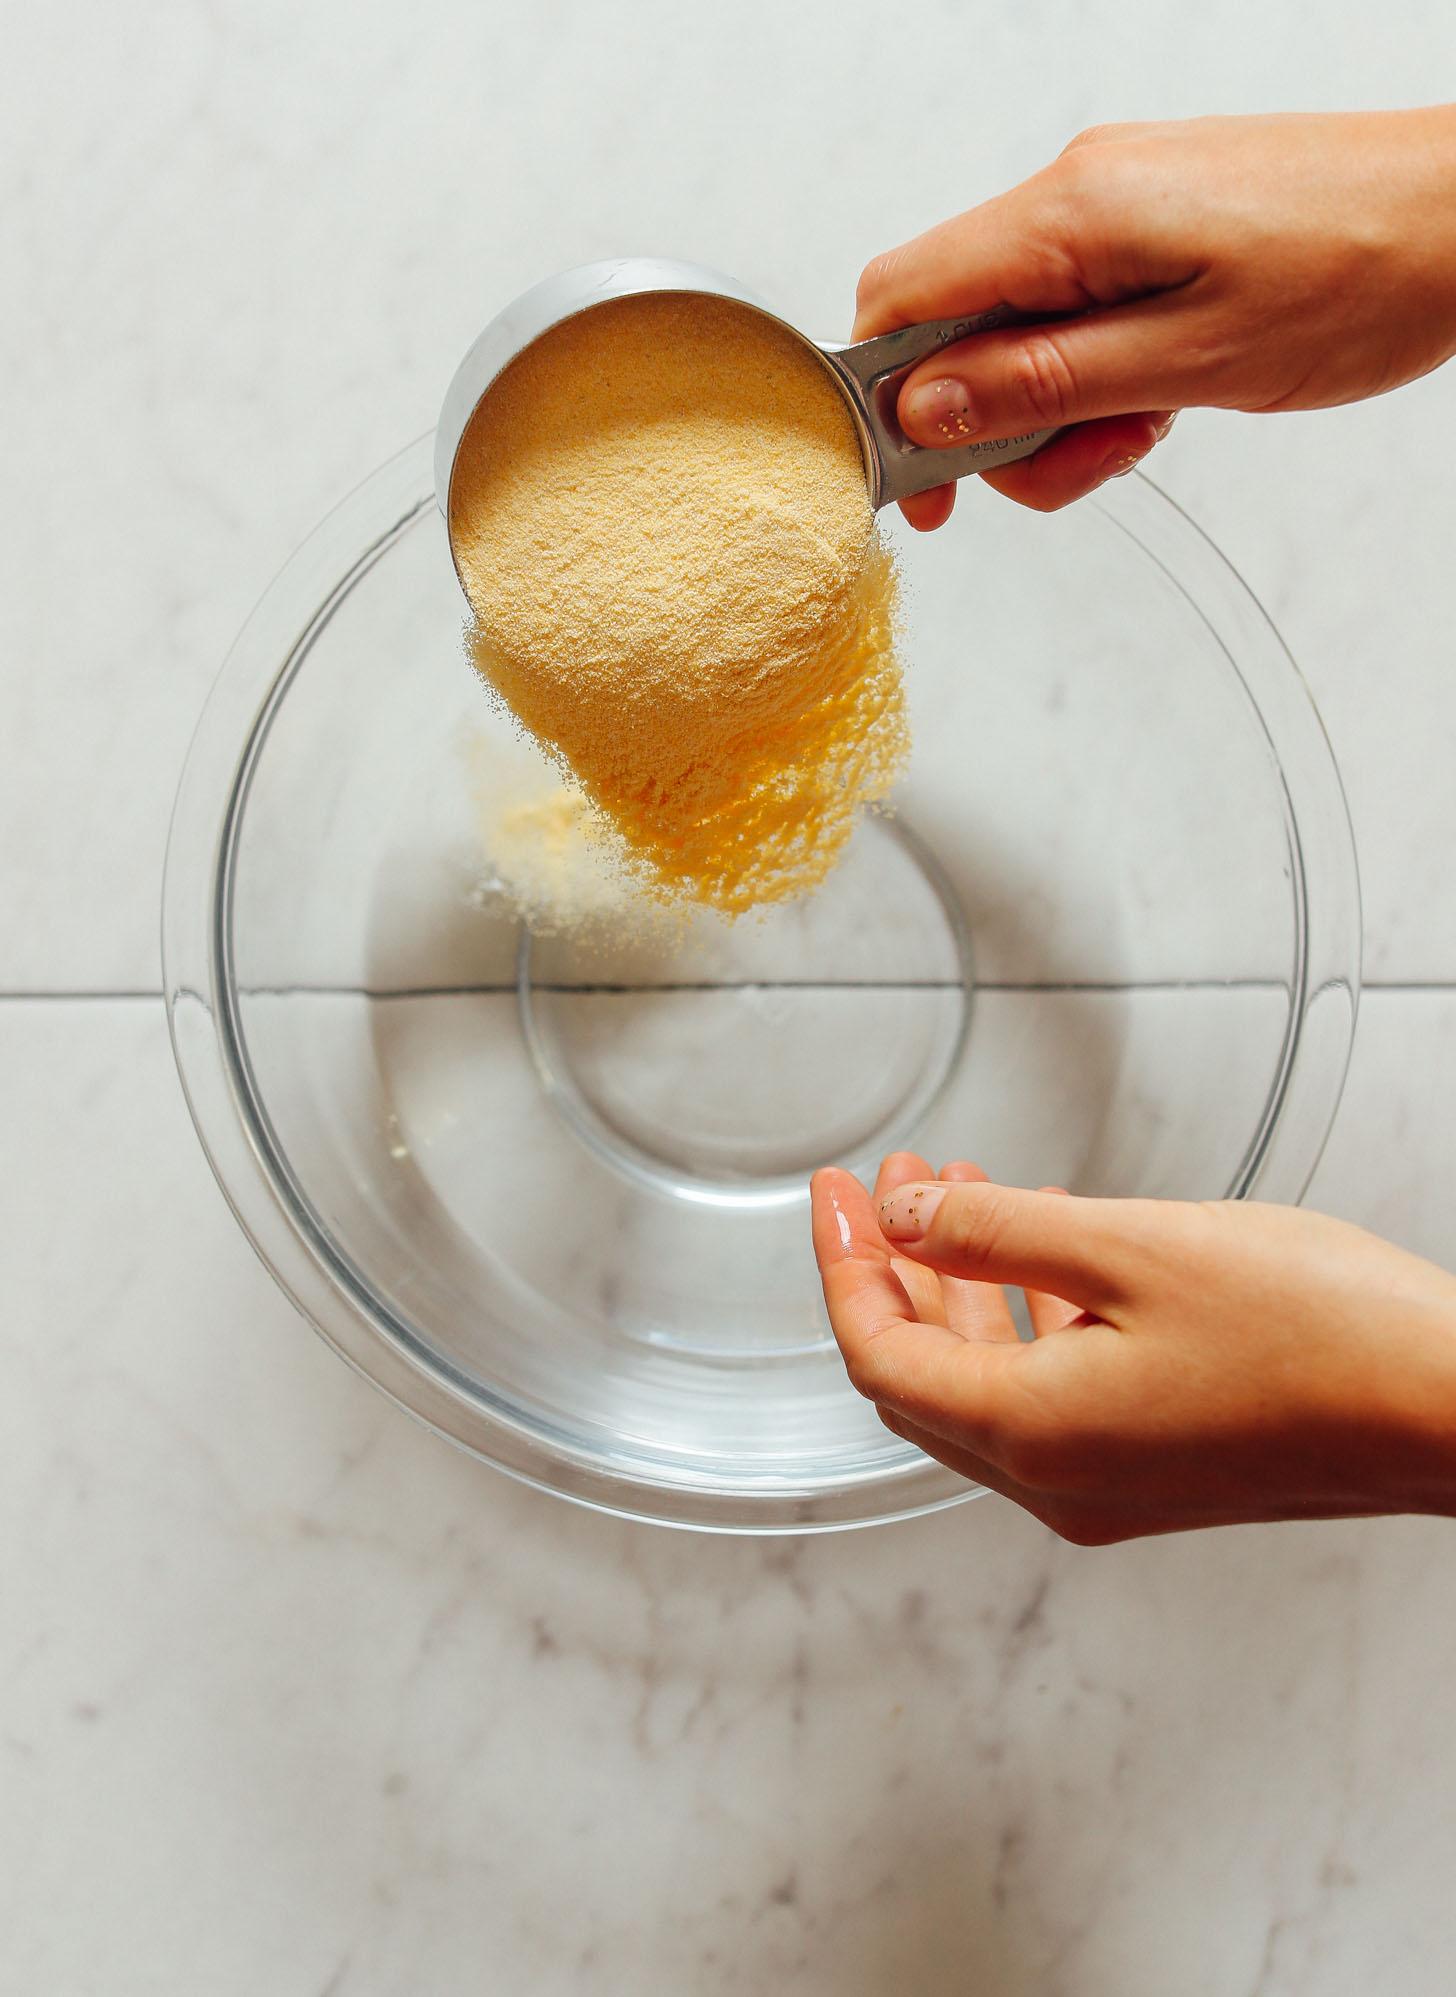 Pouring areparina into a bowl for homemade Arepas